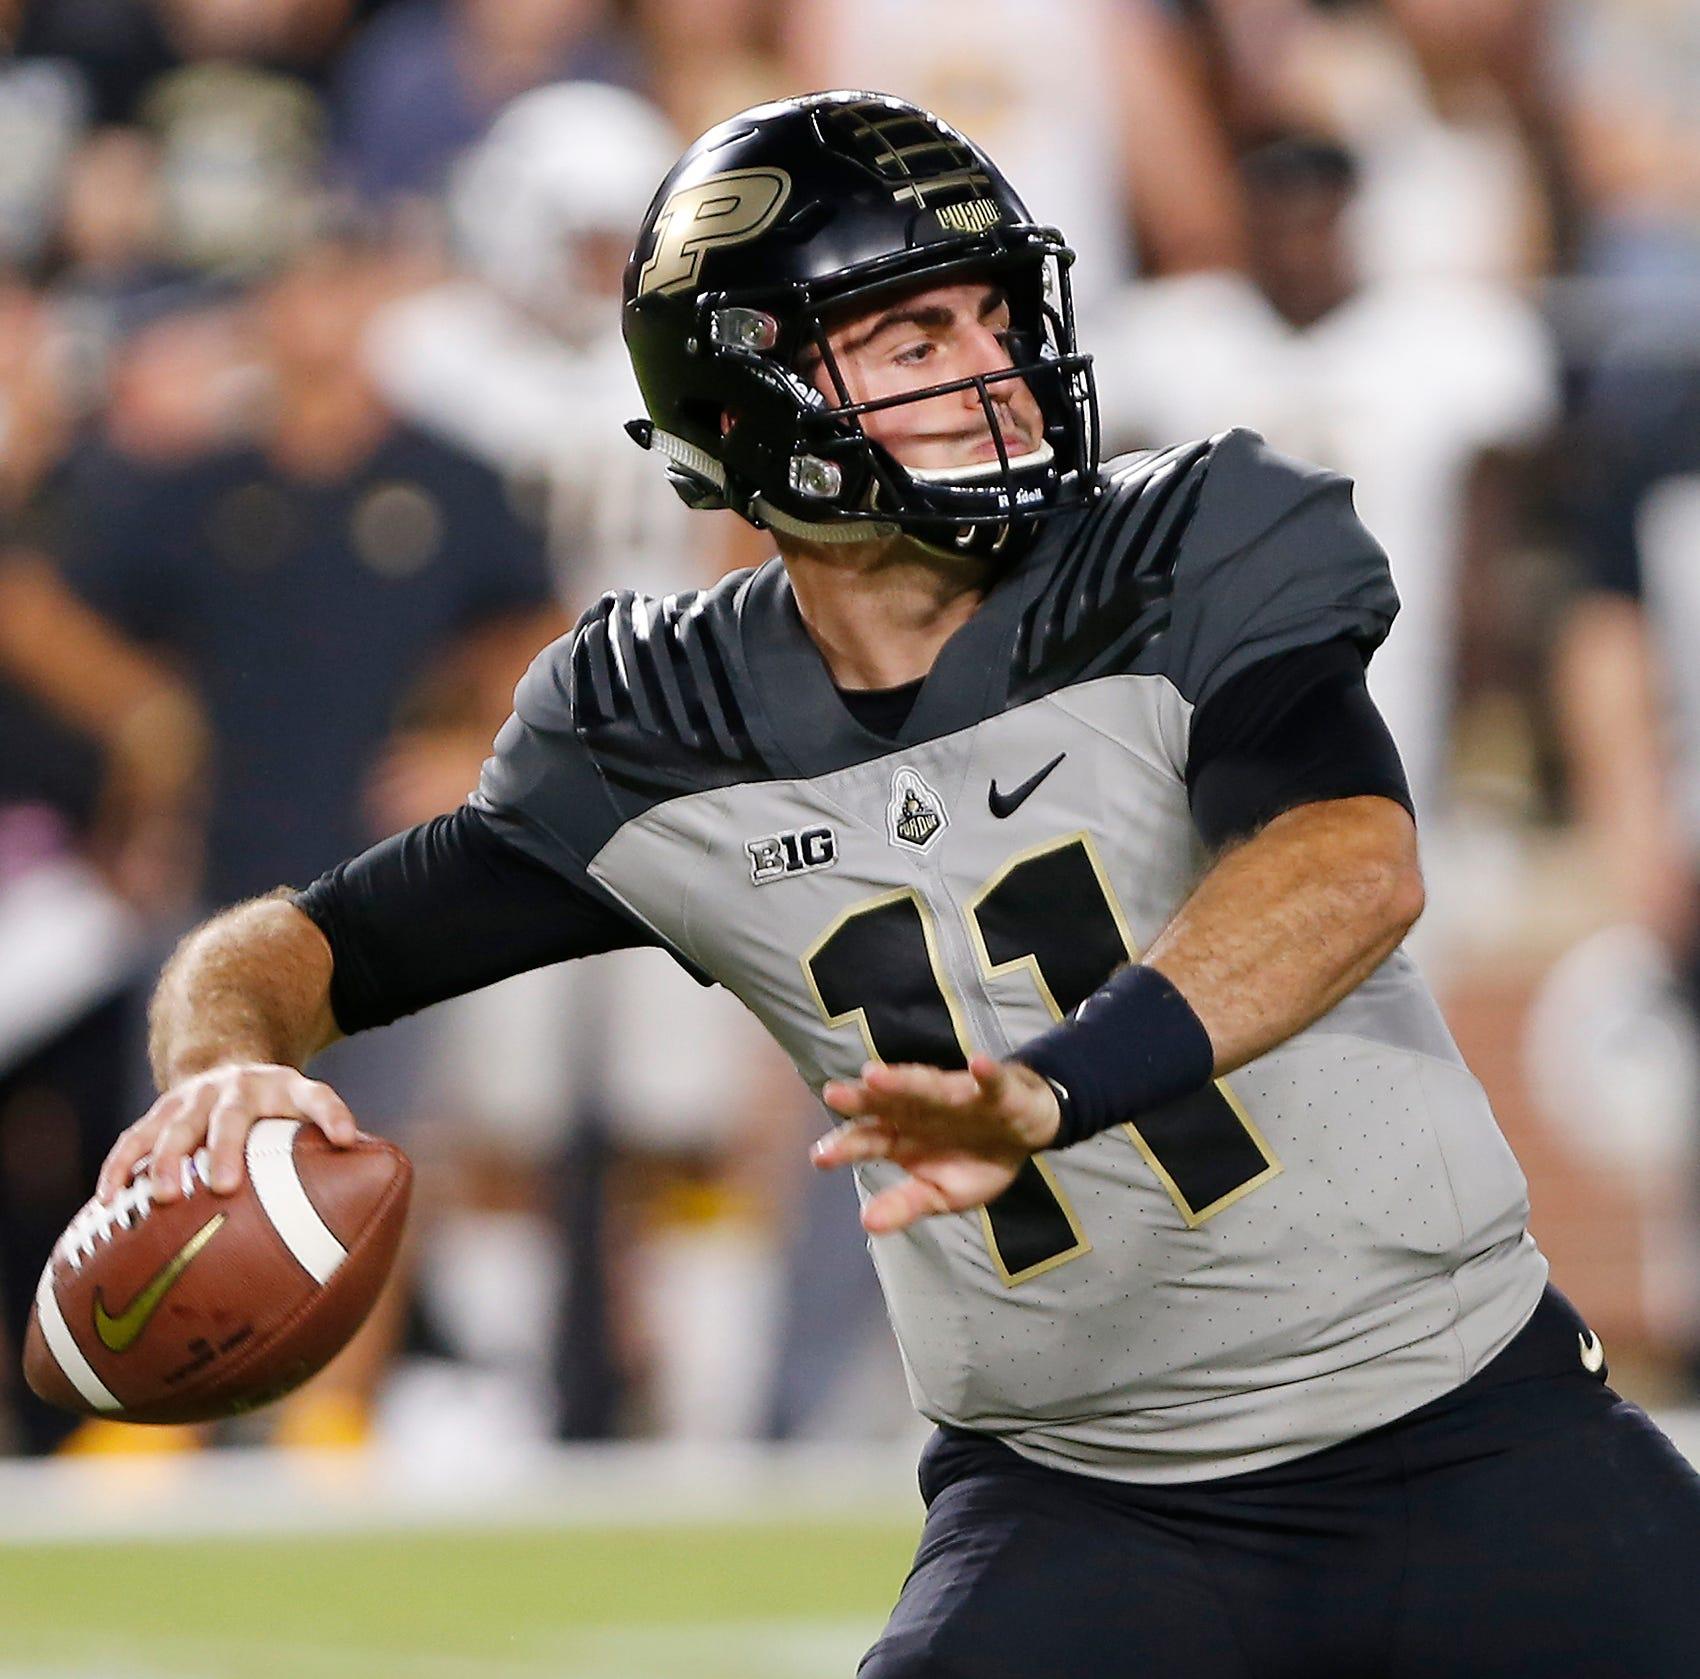 Purdue vs. Mizzou football: Did Jared Sparks score a TD? Social media has its say